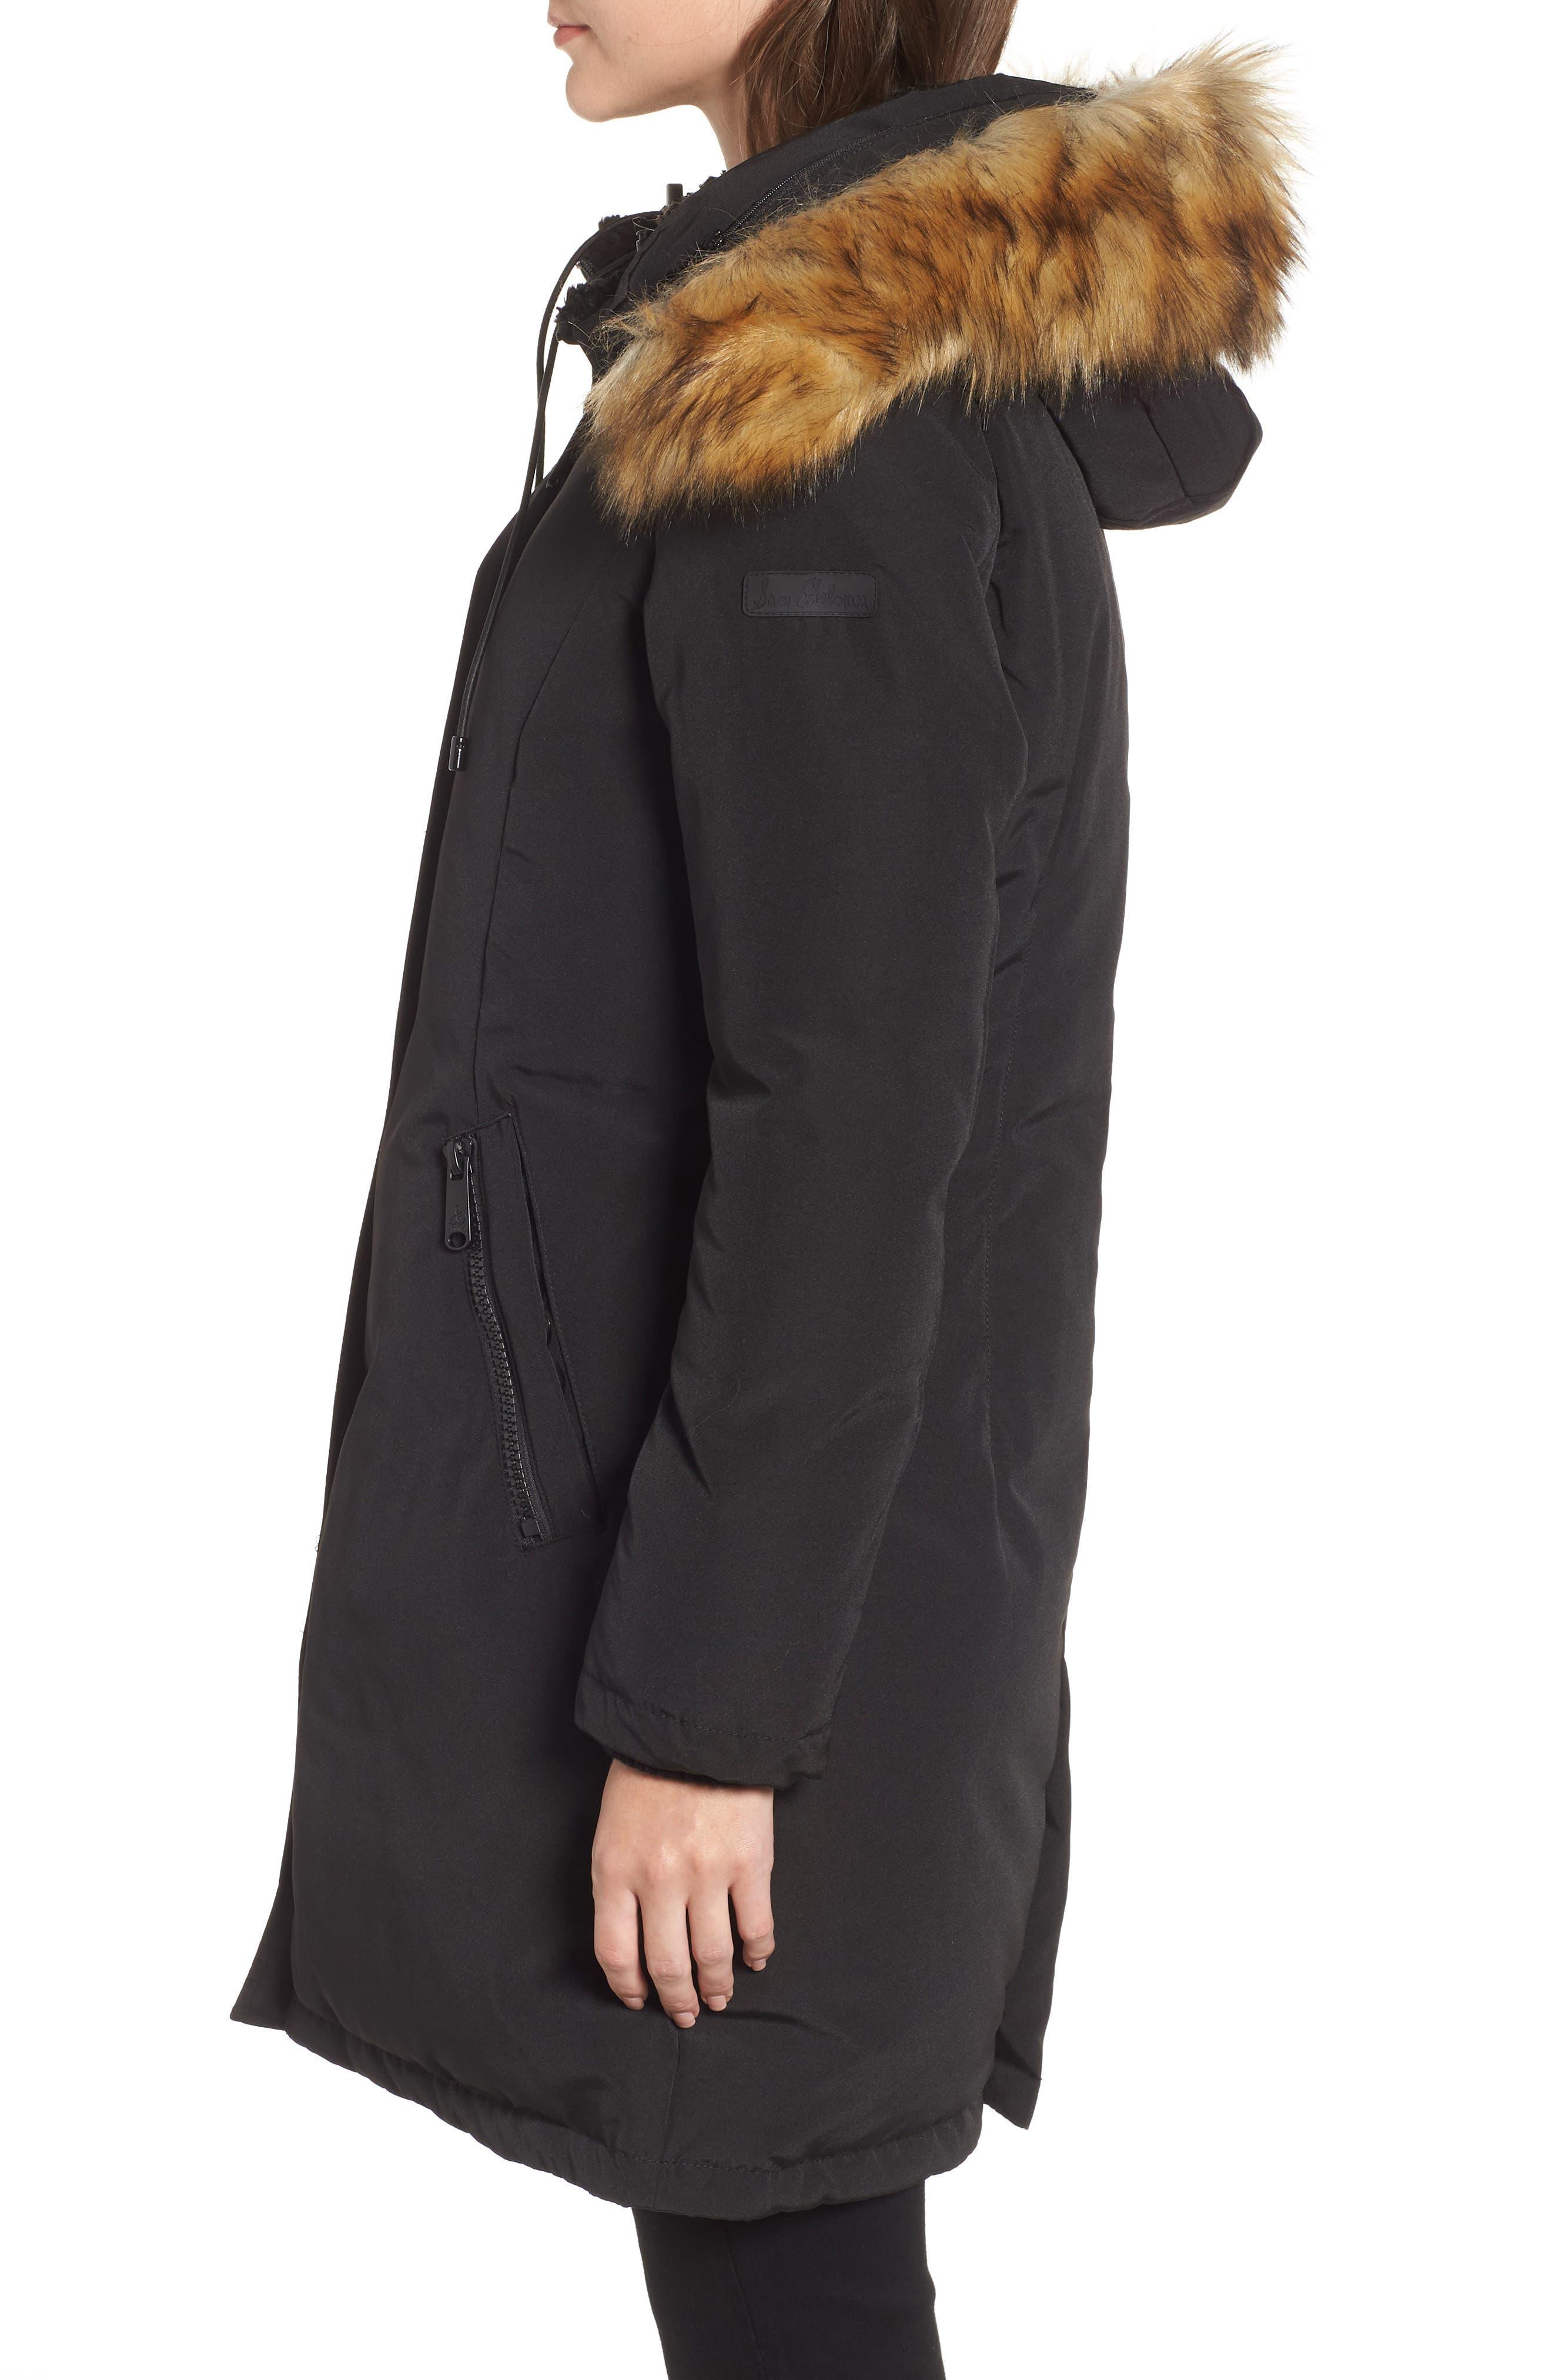 SAM EDELMAN, Faux Fur Trim Down Jacket, Alternate thumbnail 4, color, 001